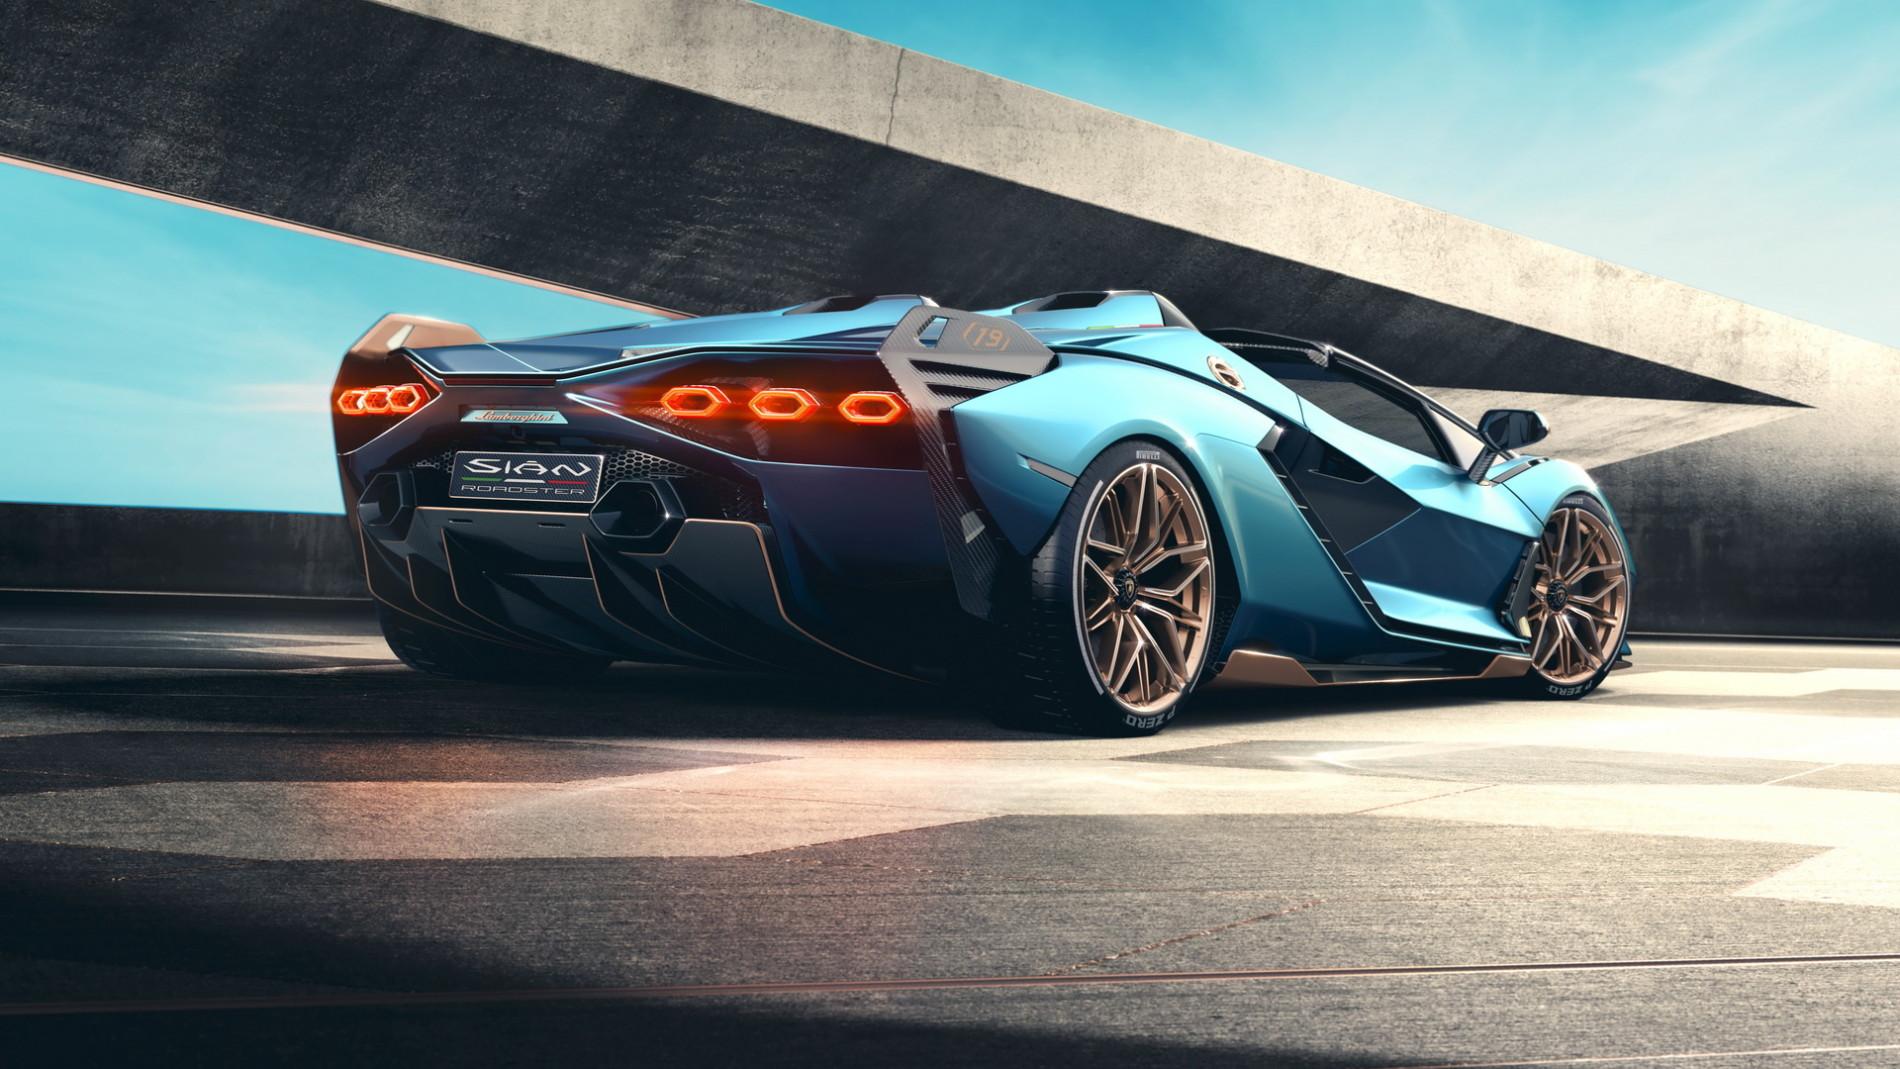 Lamborghini Sian Roadster - Lamborghini Sian Roadster